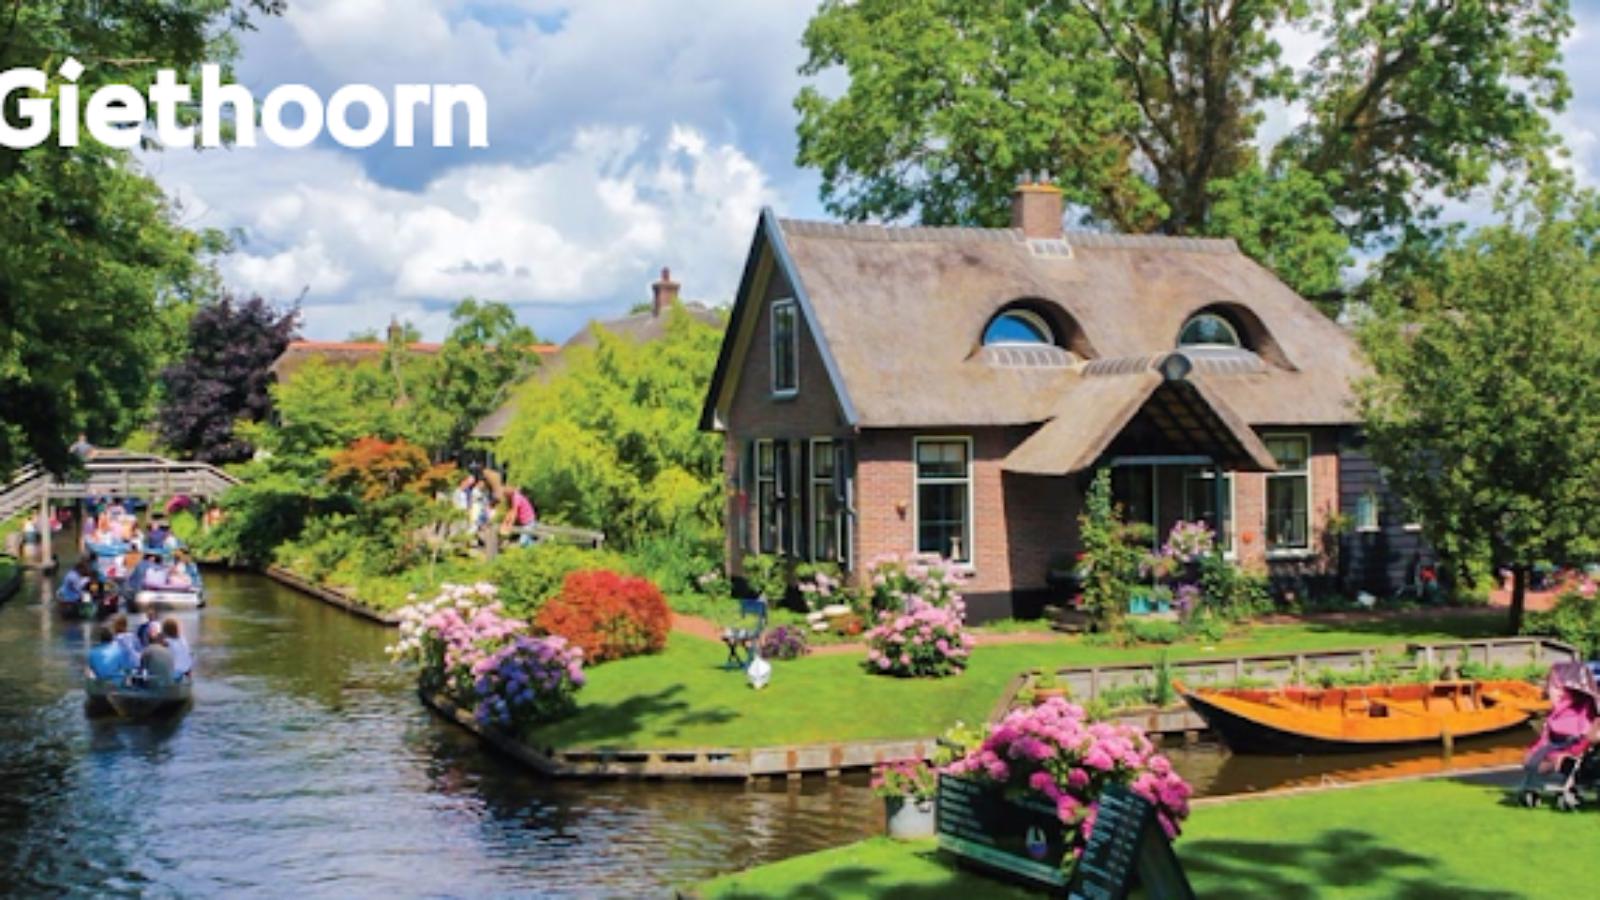 Giethoorn, il villaggio senza strade